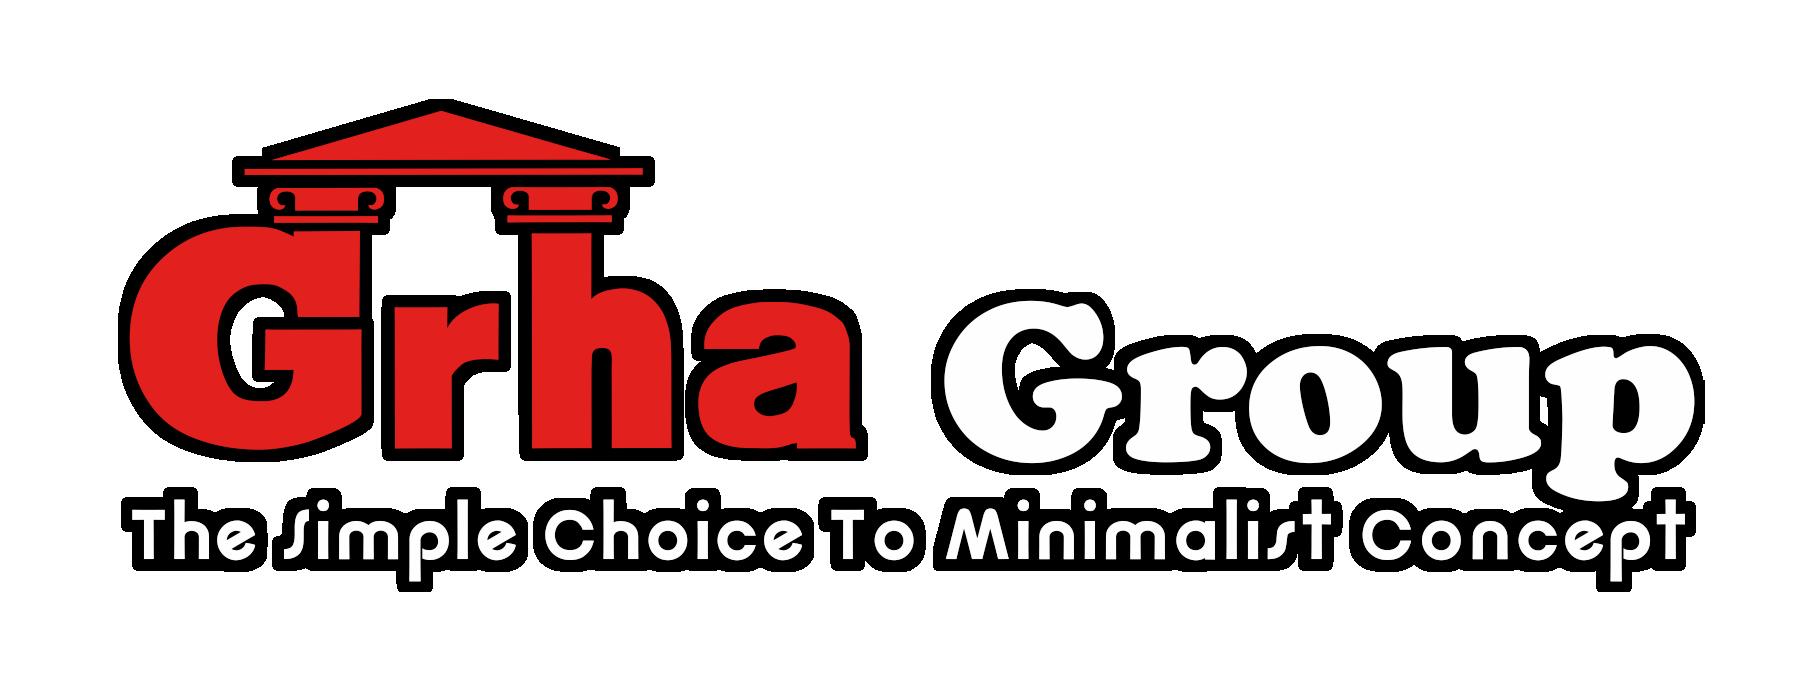 home graha developer